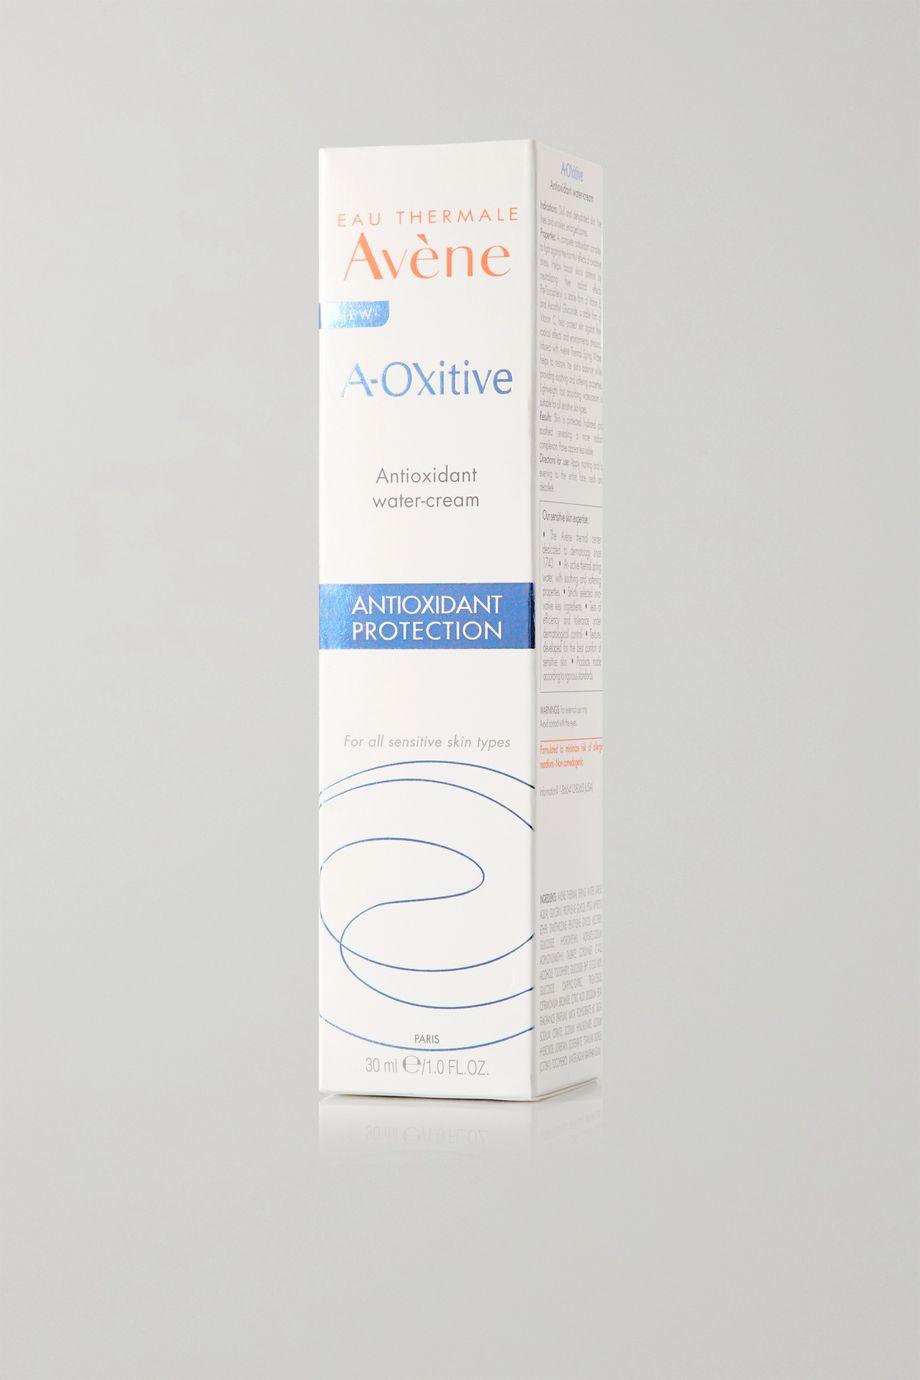 Avene A-OXitive Antioxidant Water-Cream, 30ml